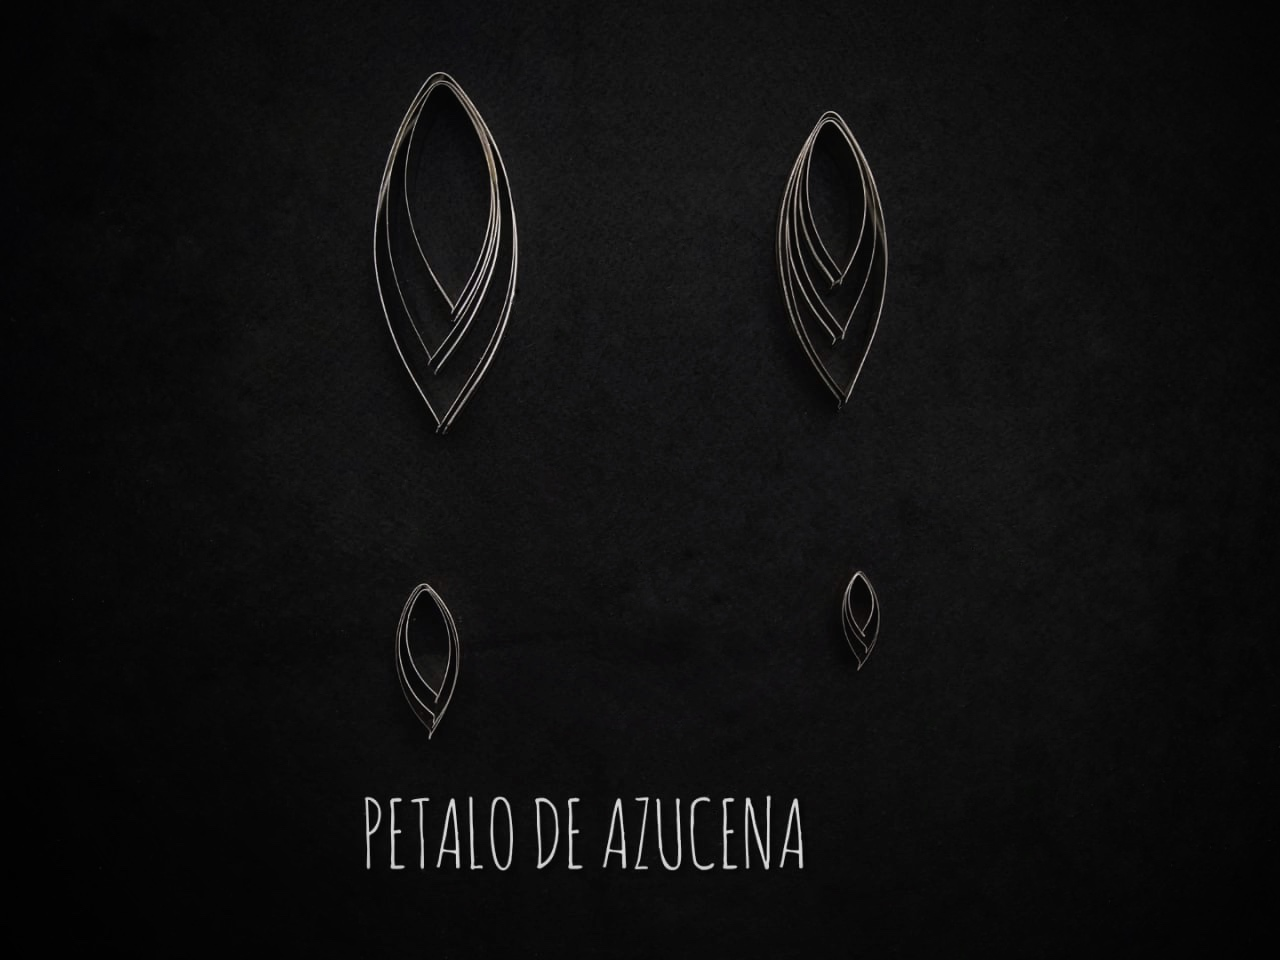 PETALO DE AZUCENA